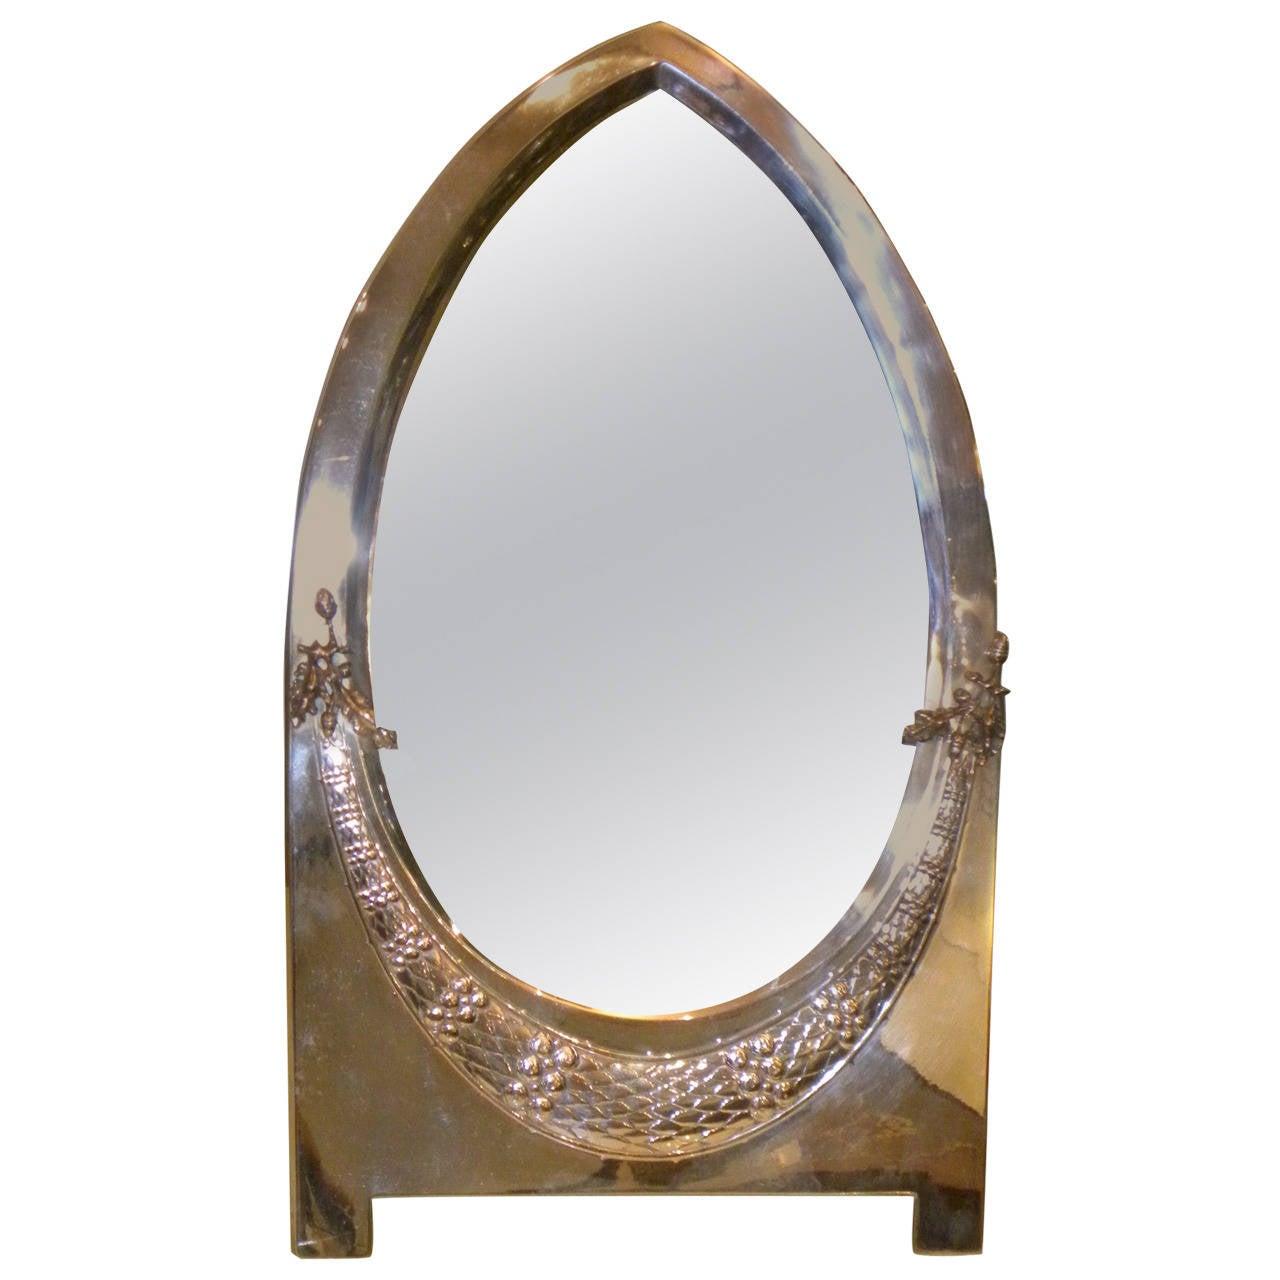 Elegant Silver Art Deco Or Art Nouveau Wmf Table Mirror At